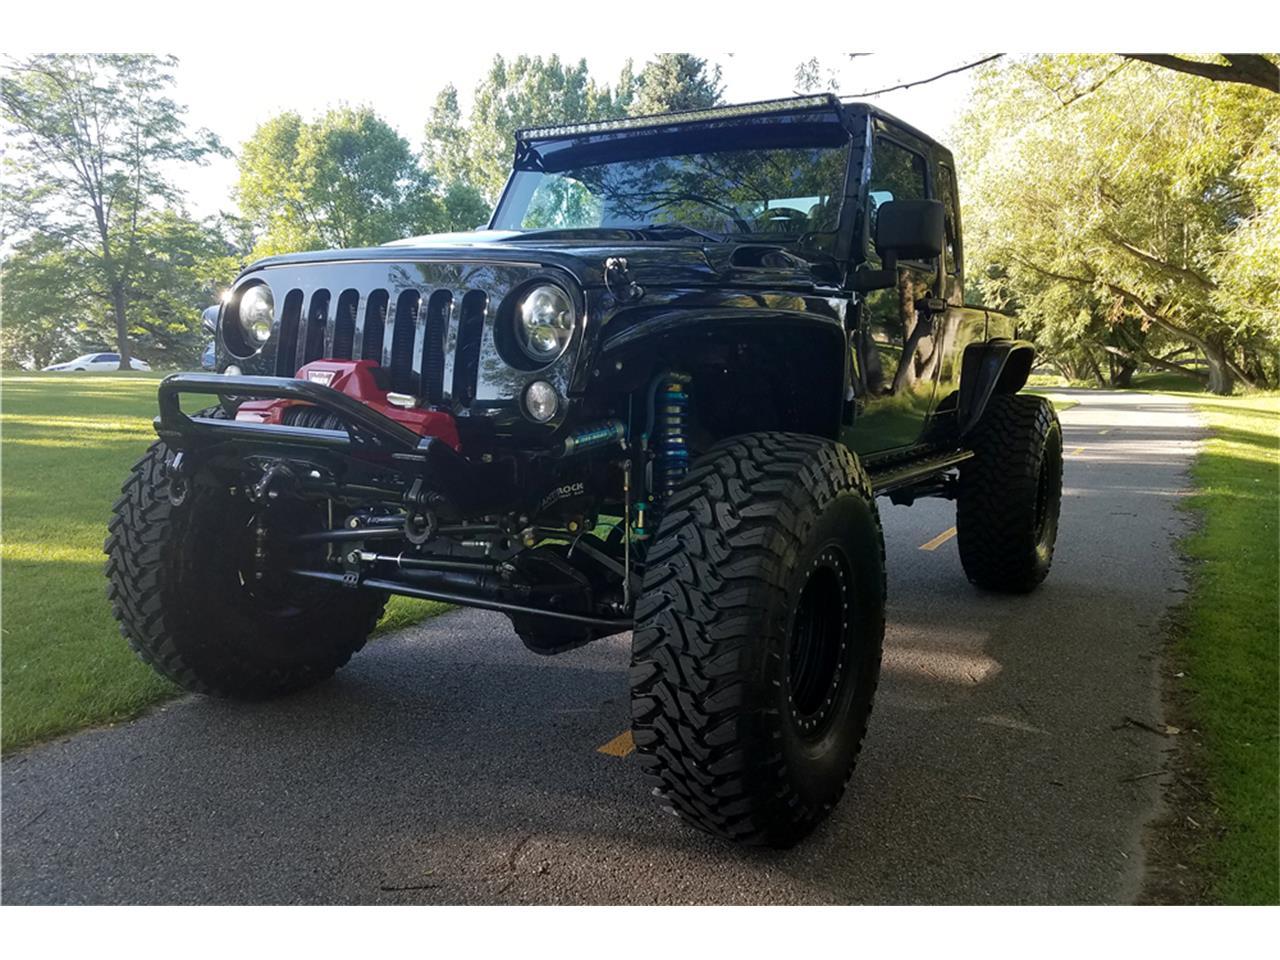 wrangler jeep vegas las classic financing inspection insurance transport nevada